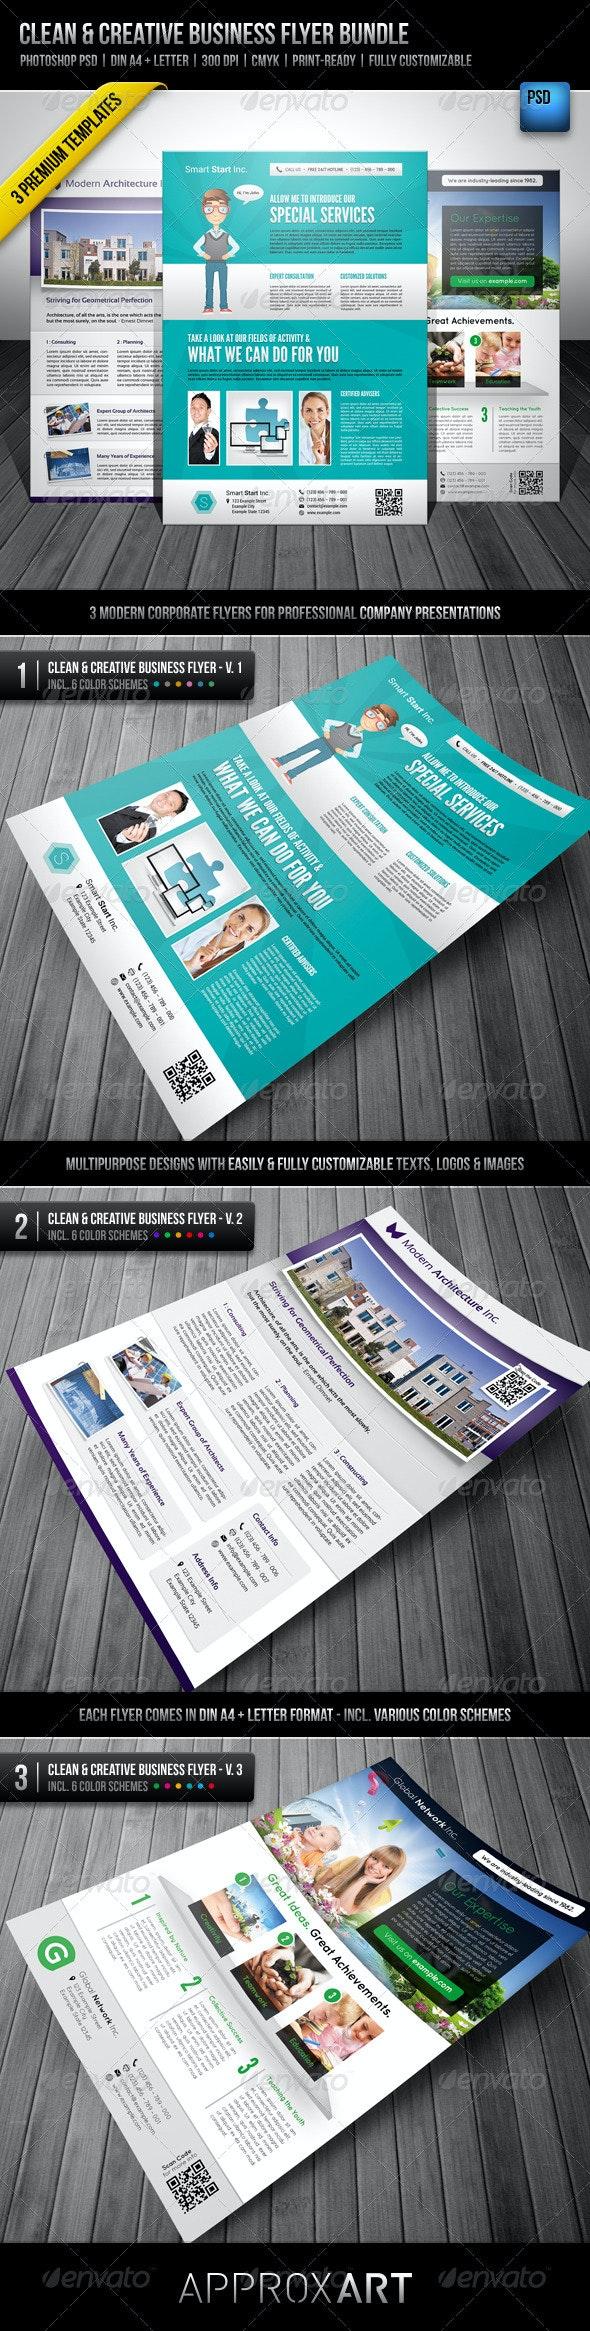 Clean & Creative Business Flyer Bundle - Corporate Flyers